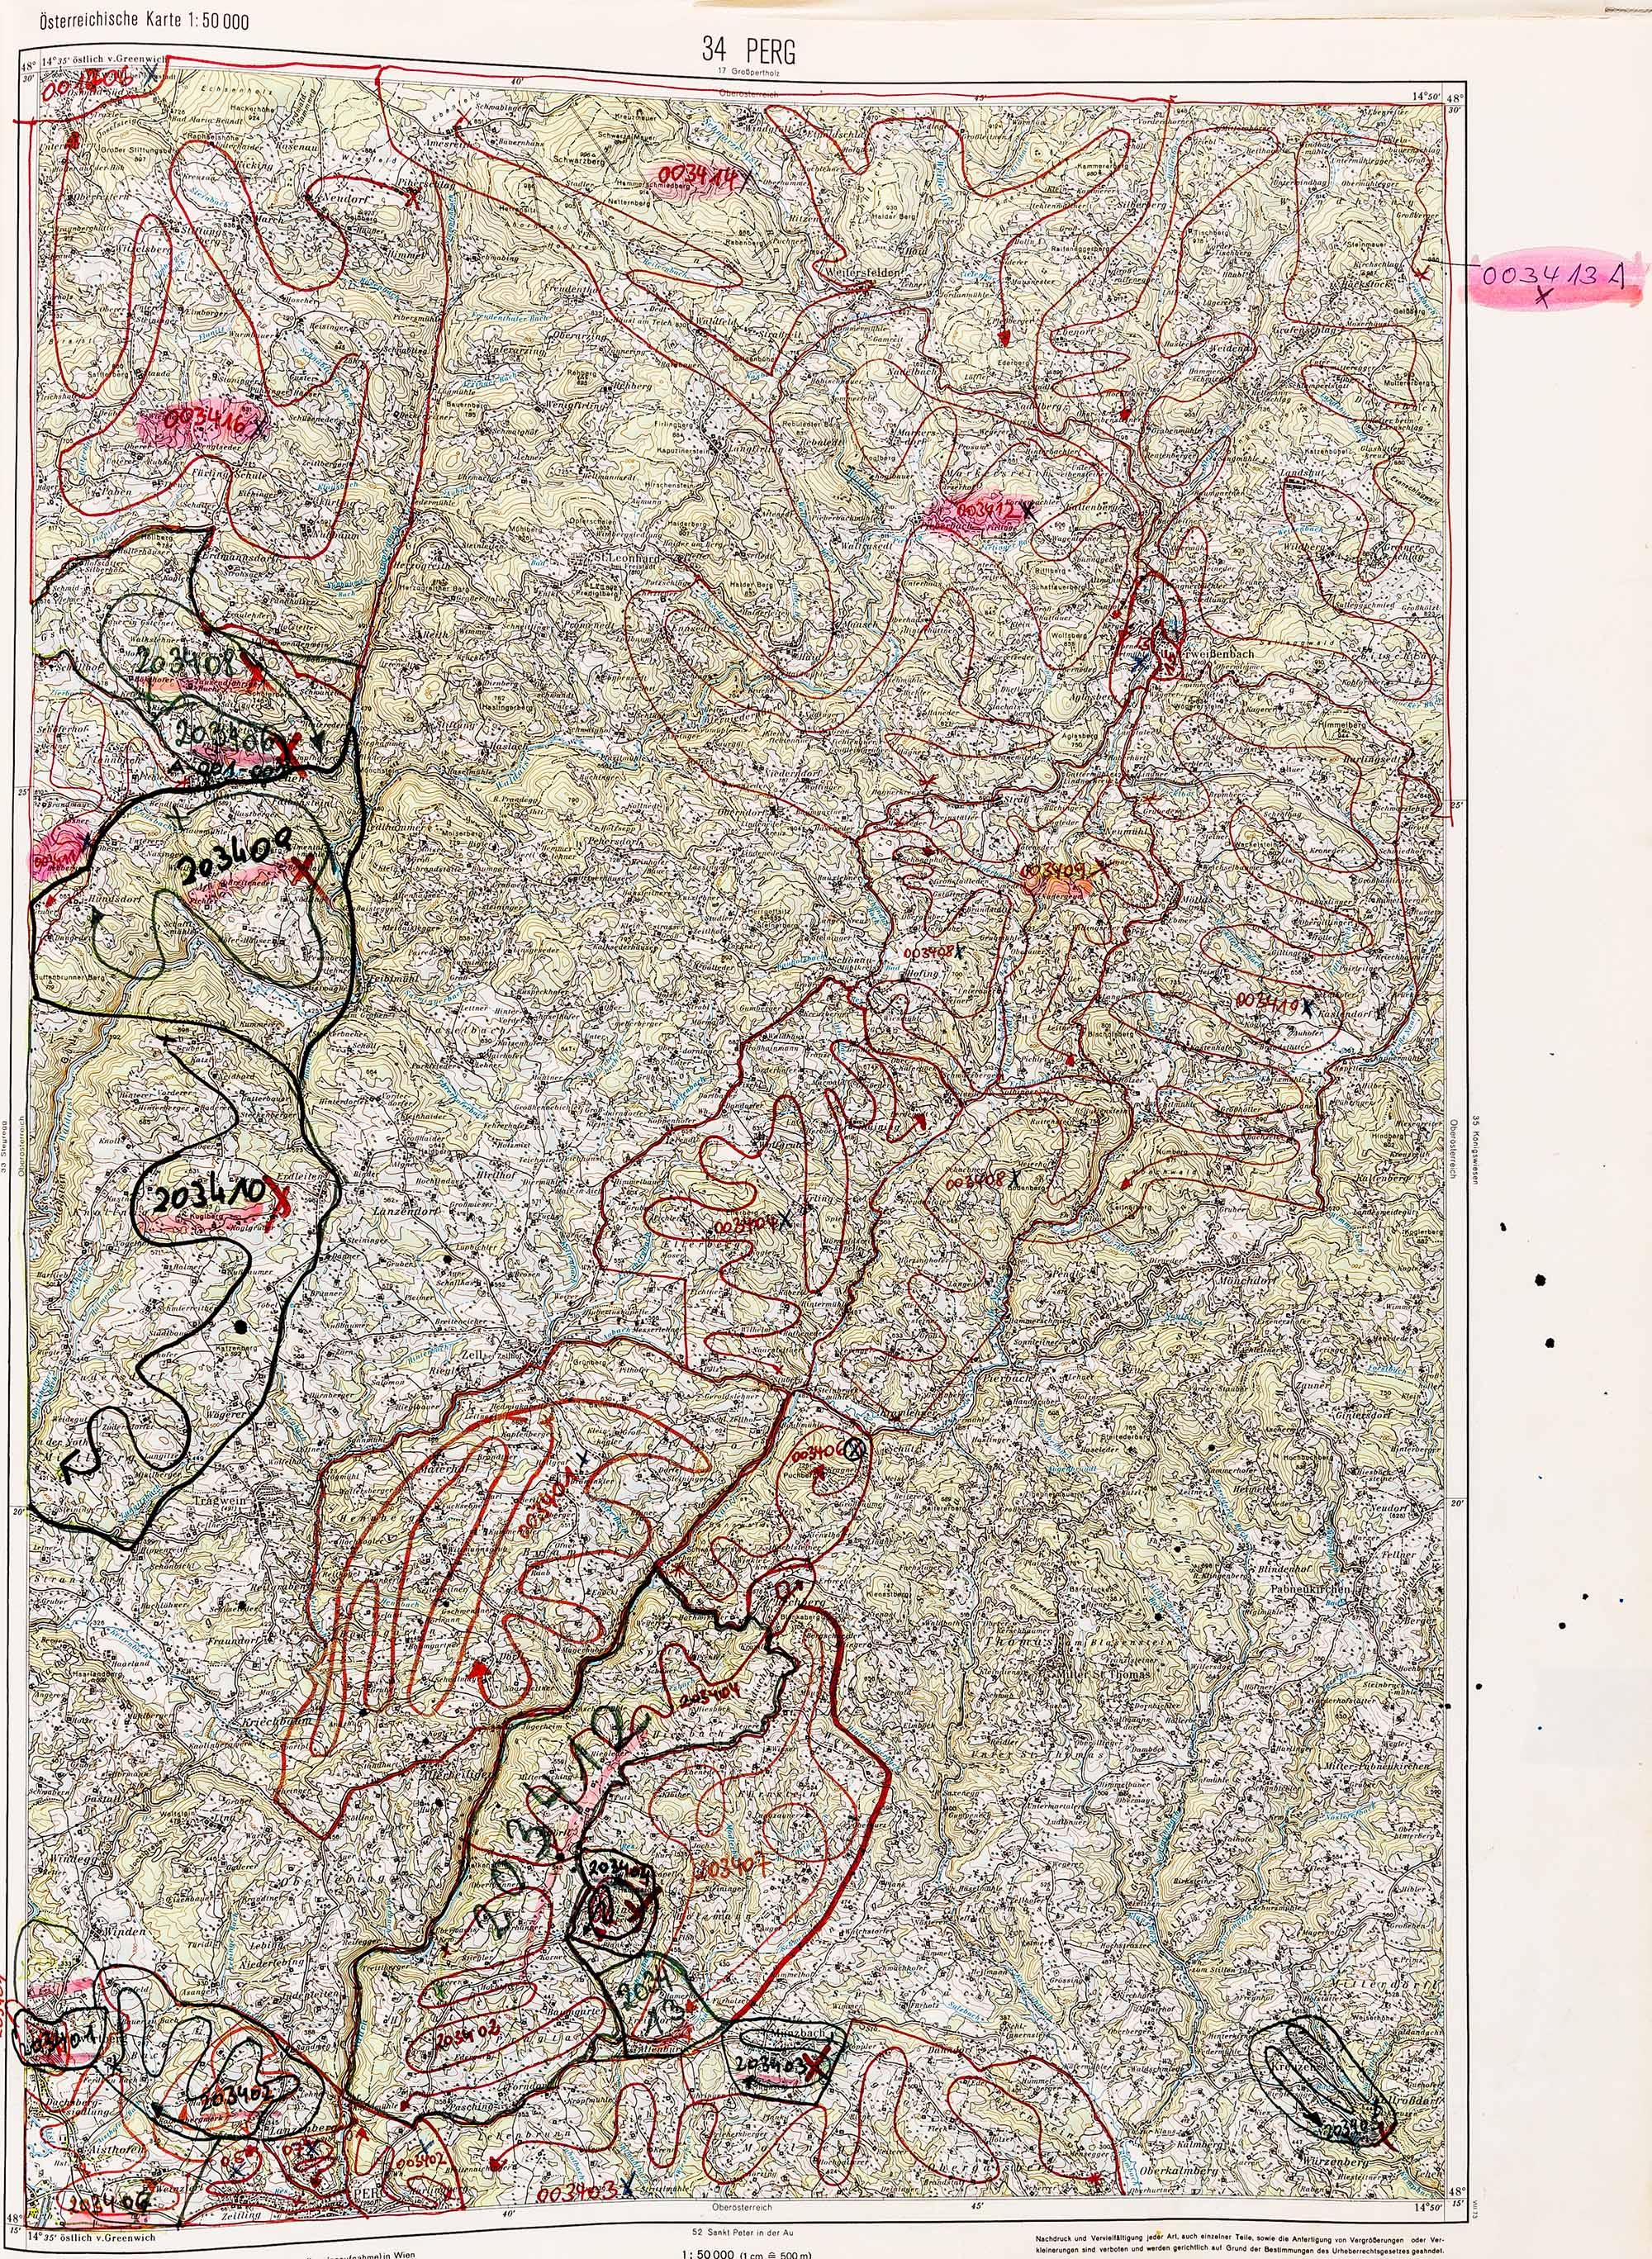 1979-1982 Karte 034